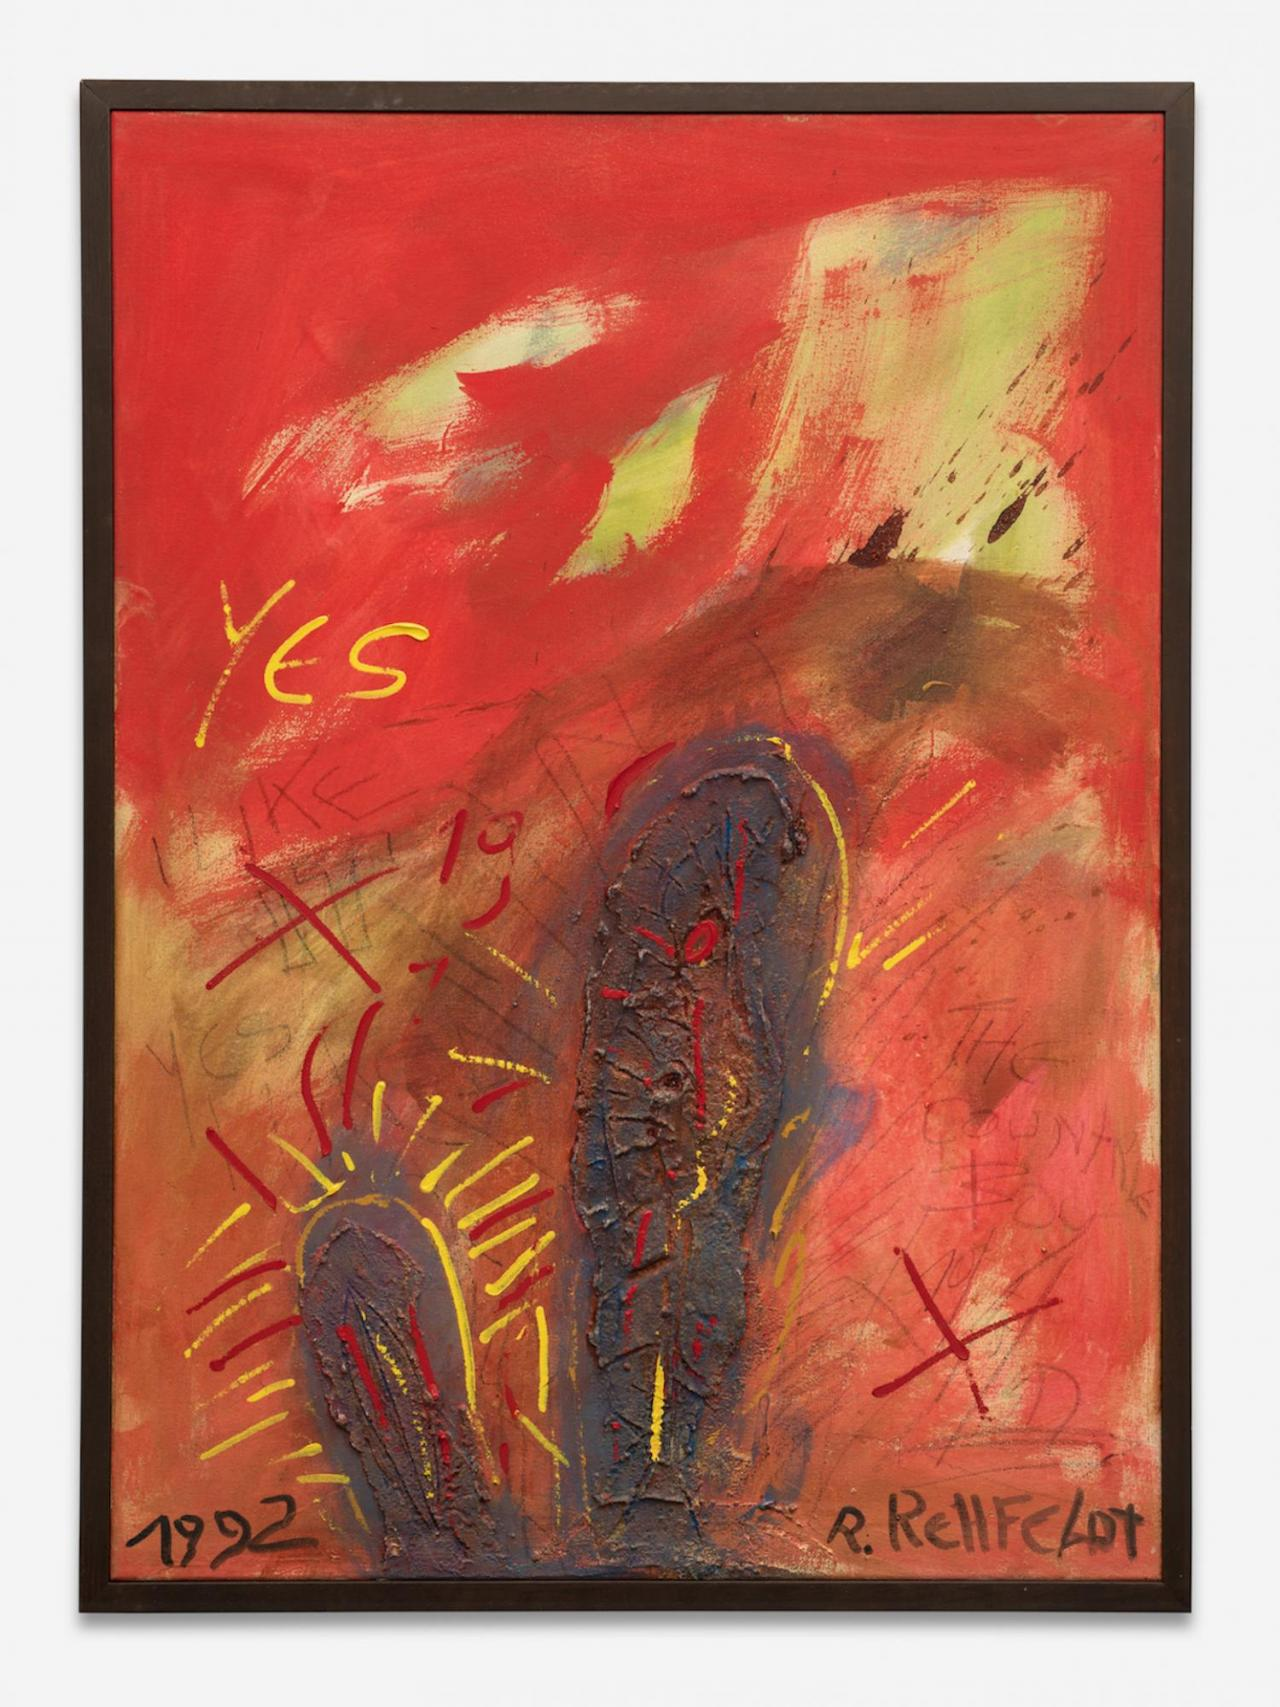 Robert Rehfeldt, Yes , 1992. Paint on canvas, 146 × 106 cm. Courtesy: the artist and ChertLüdde, Berlin. Photo: Trevor Lloyd